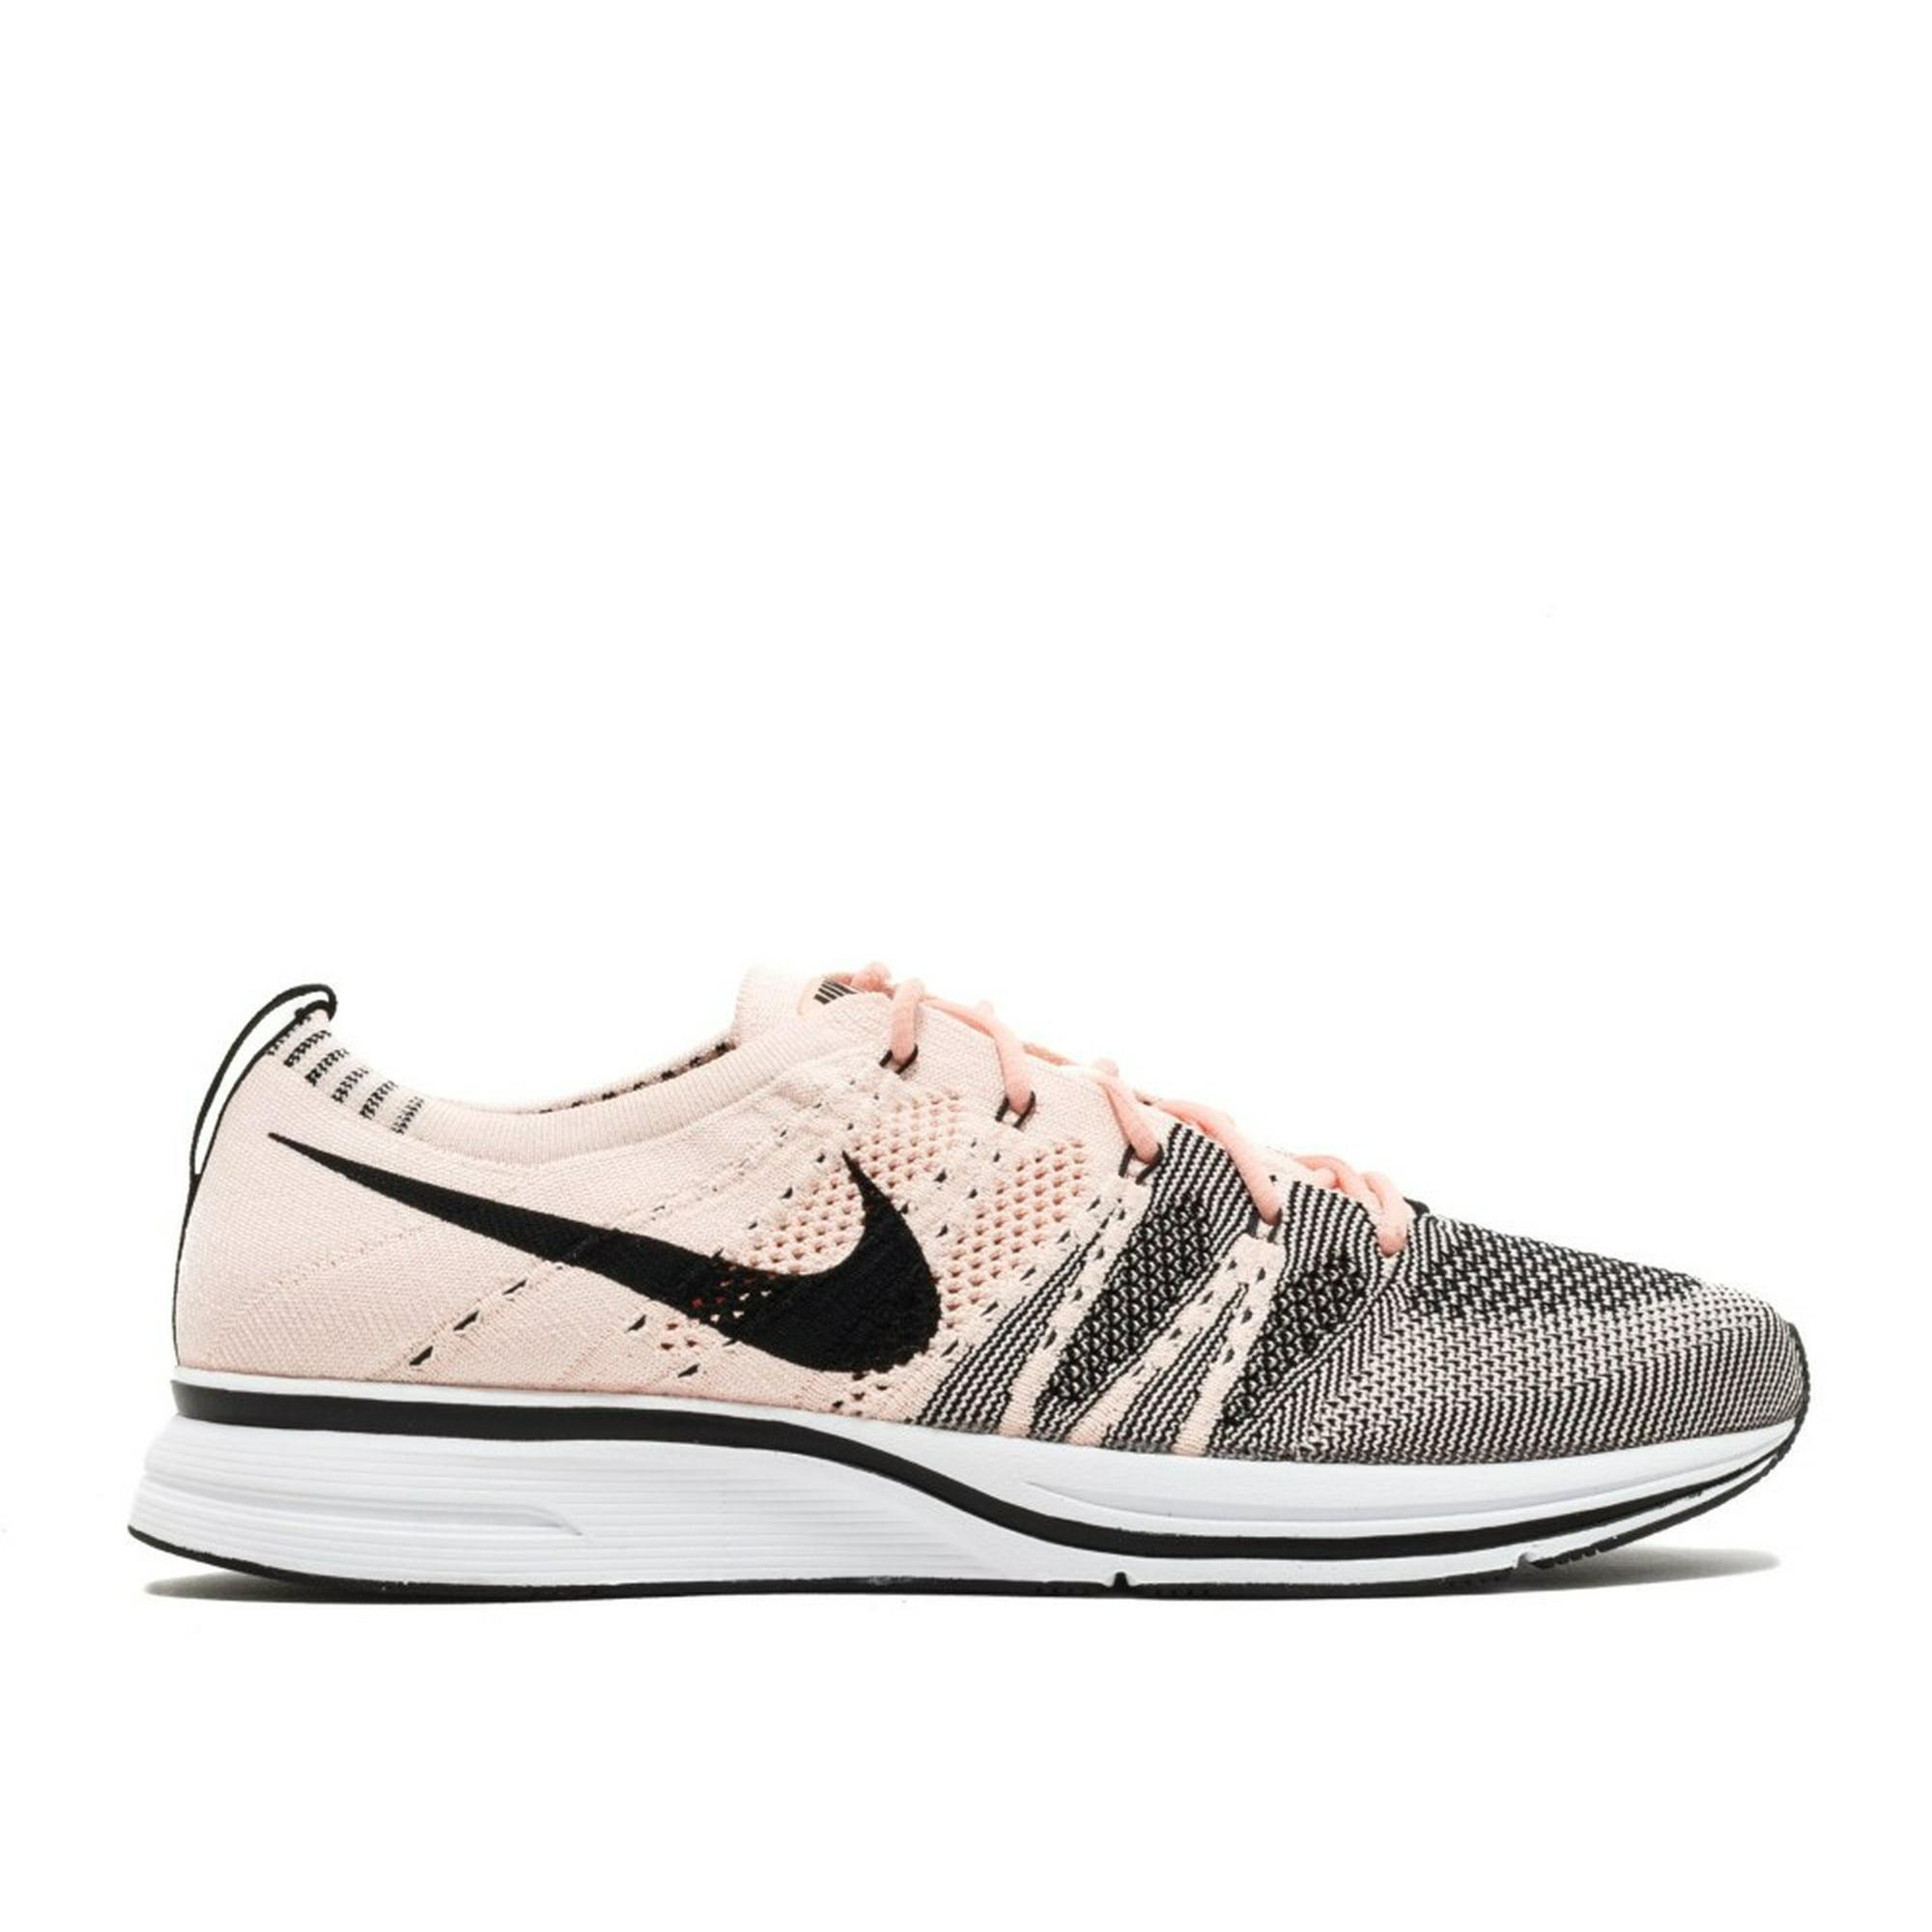 11e020d8a273 Nike - Men - Nike Flyknit Trainer  Sunset Tint  - Ah8396-600 - Size ...